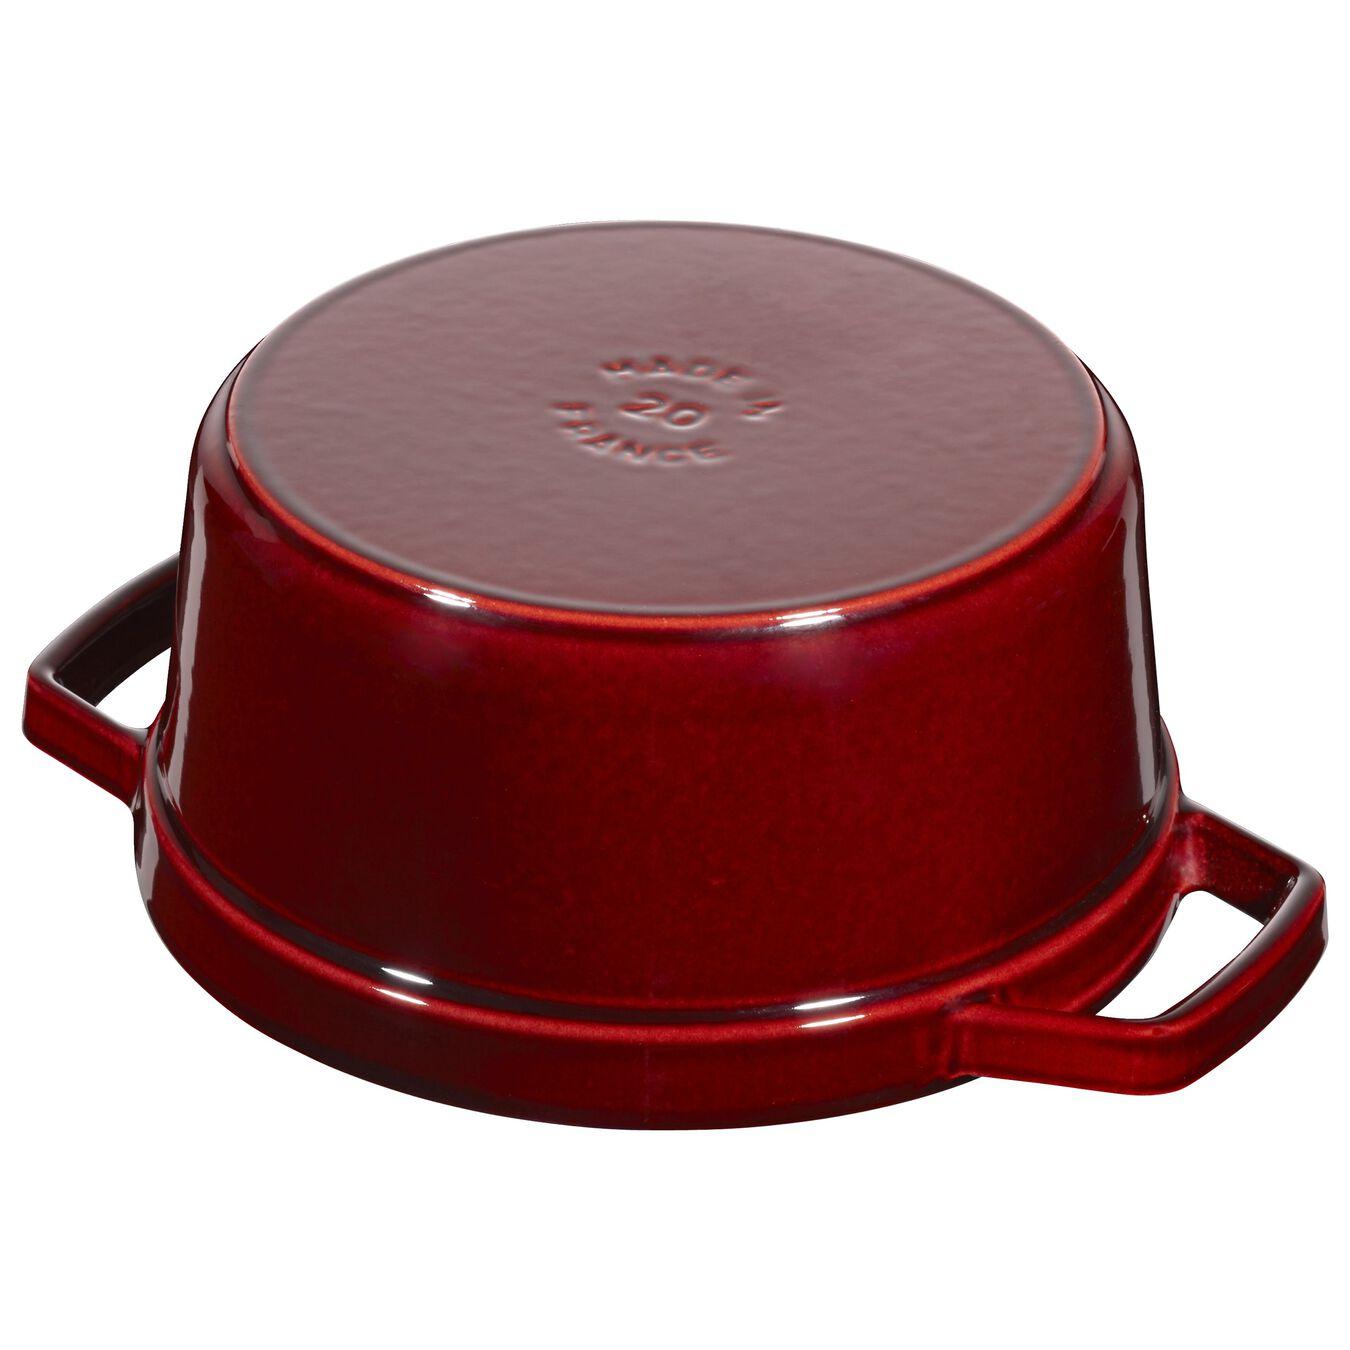 2.25 l Cast iron round Saute pan, Grenadine-Red,,large 2